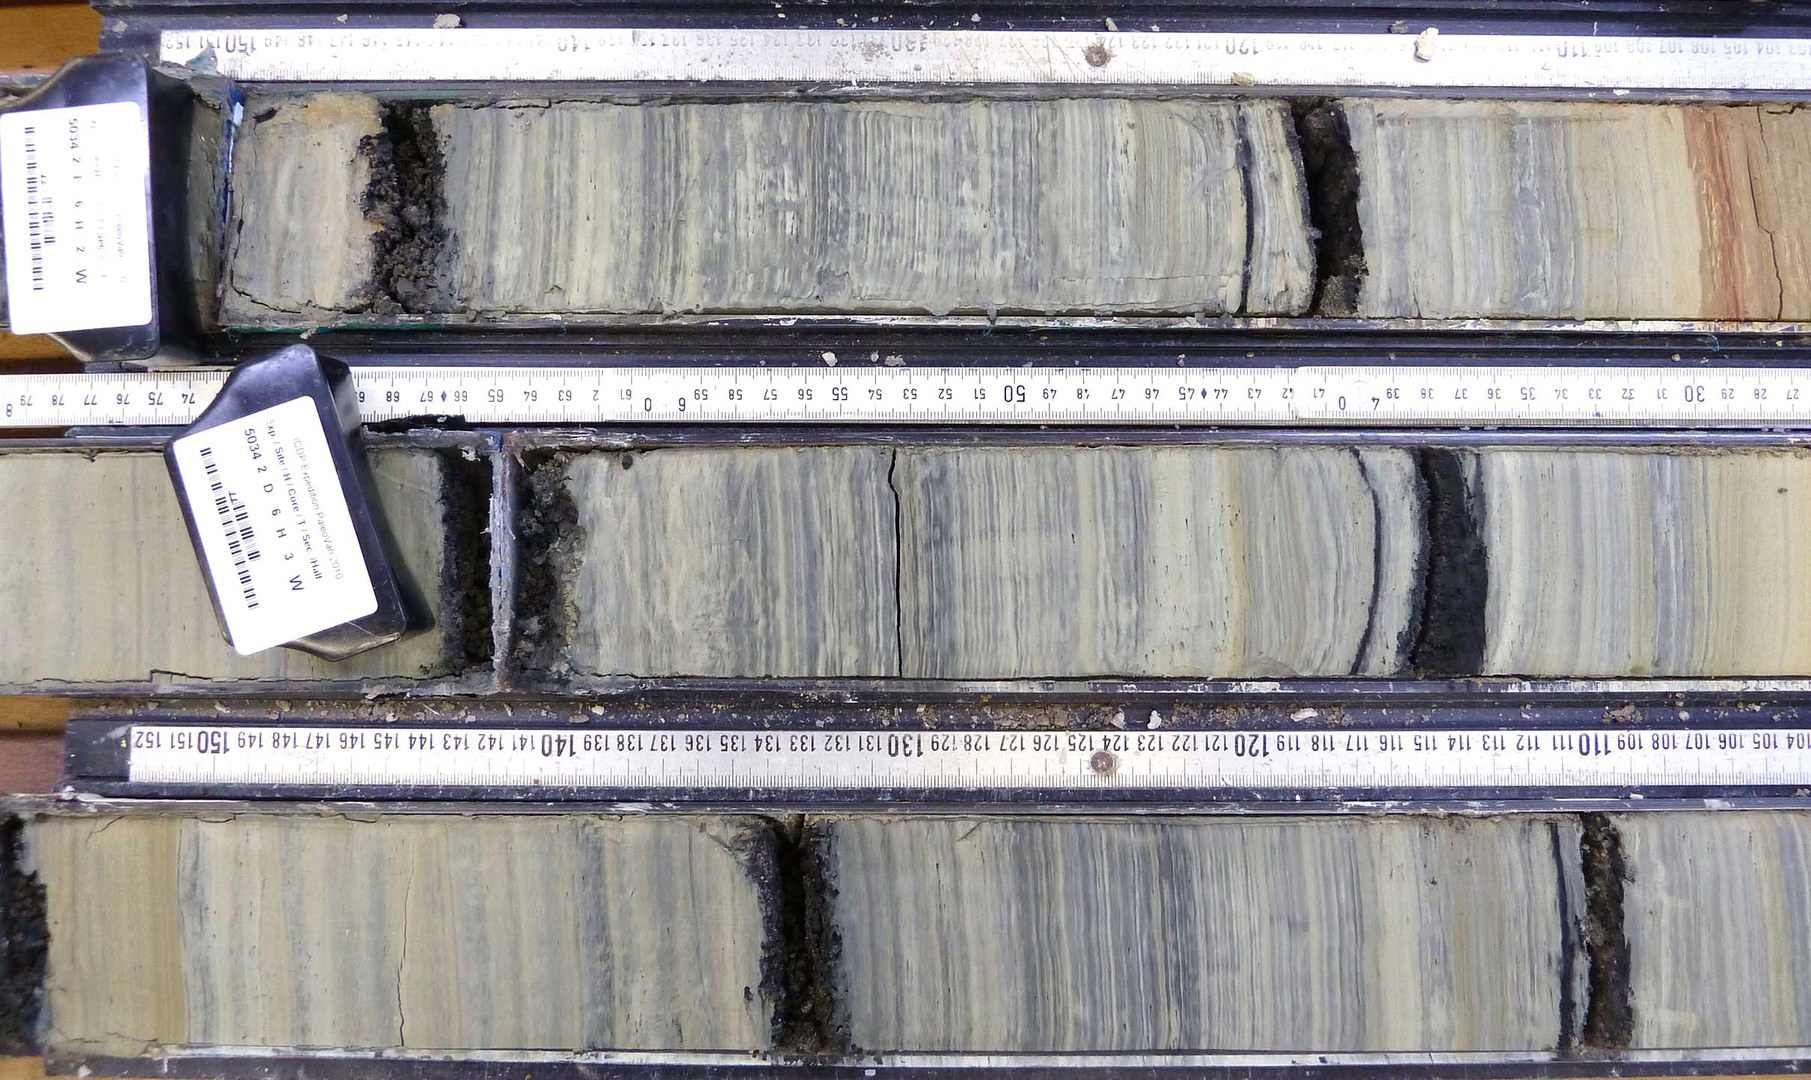 Lake Van sediments